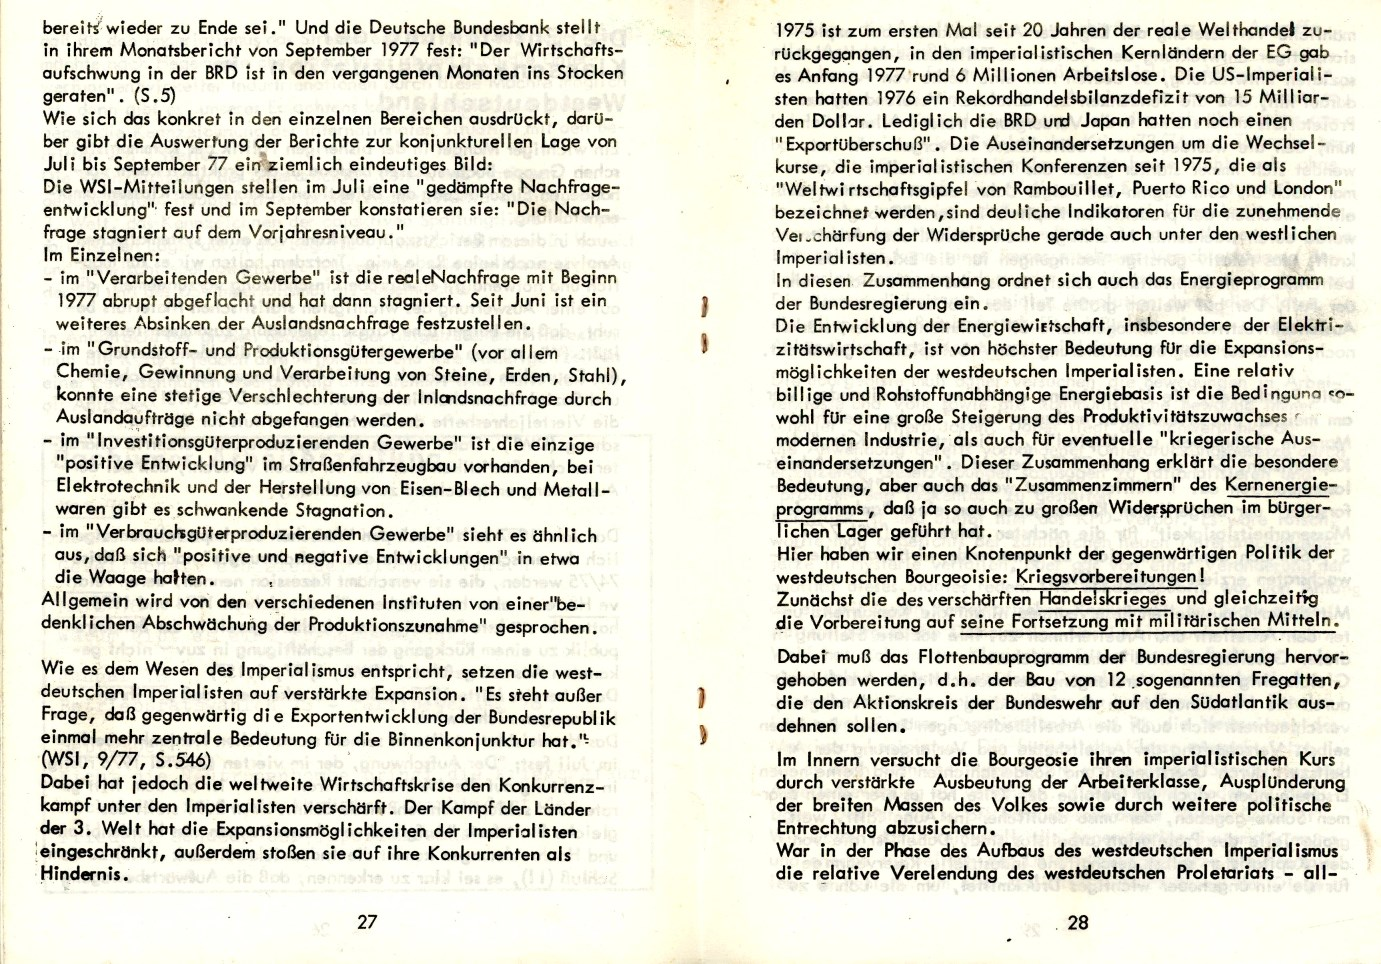 KGBE_1978_Resolutionen_15